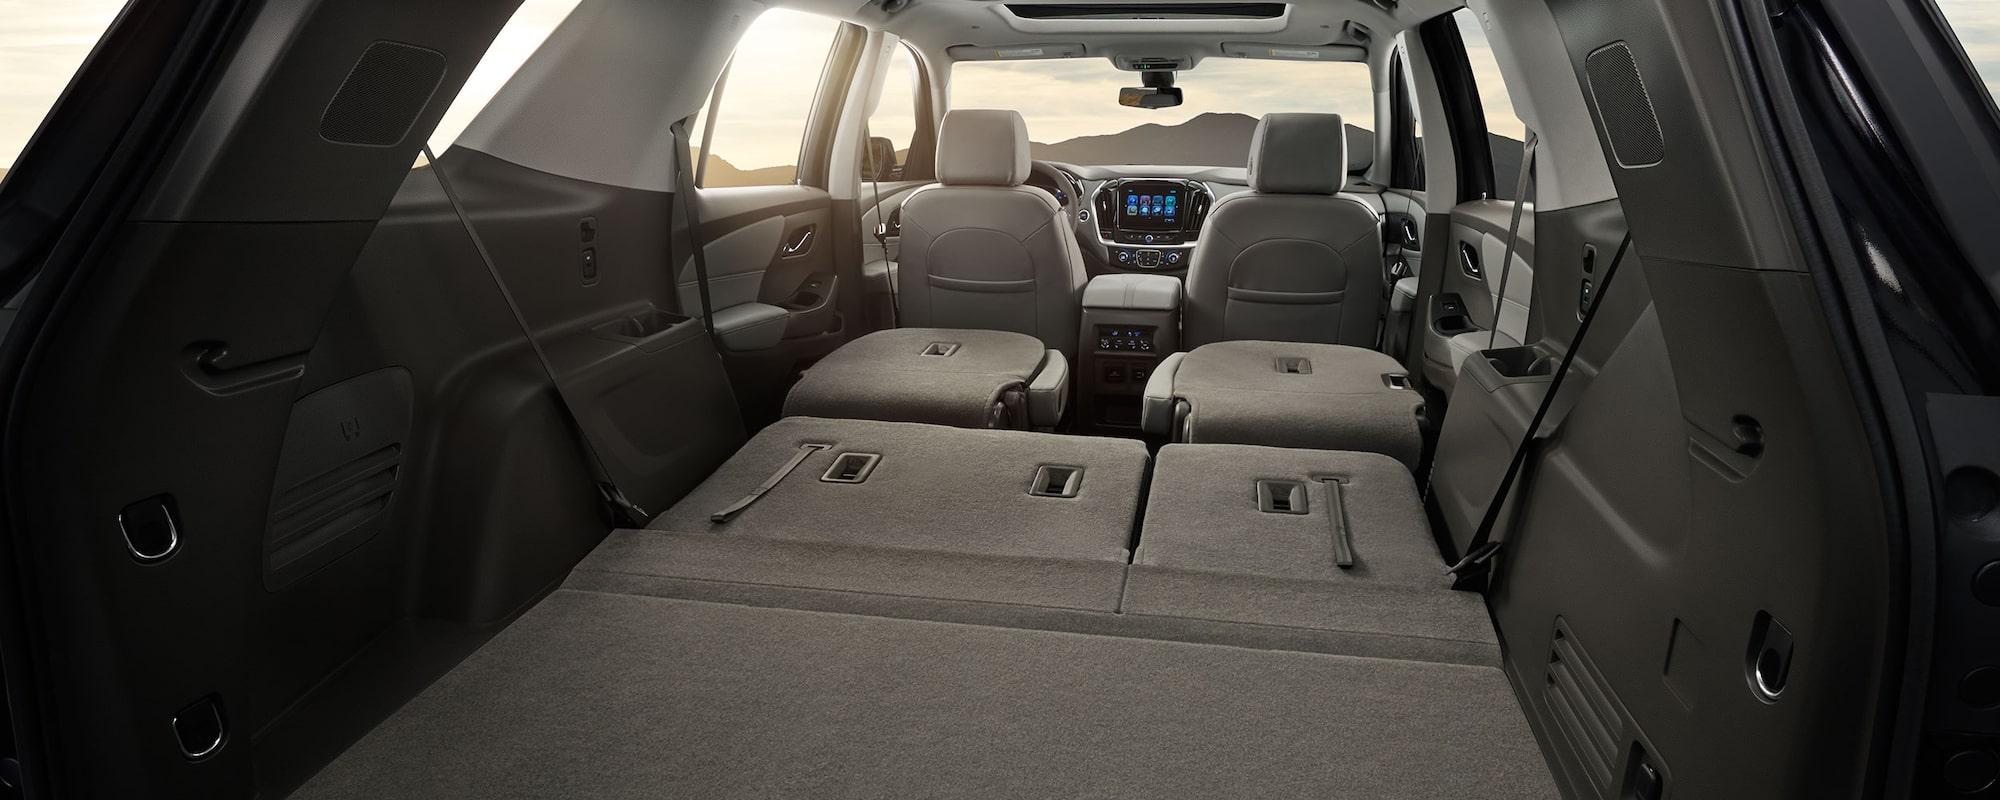 Superb 2018 Traverse Midsize SUV Design: Cargo Space